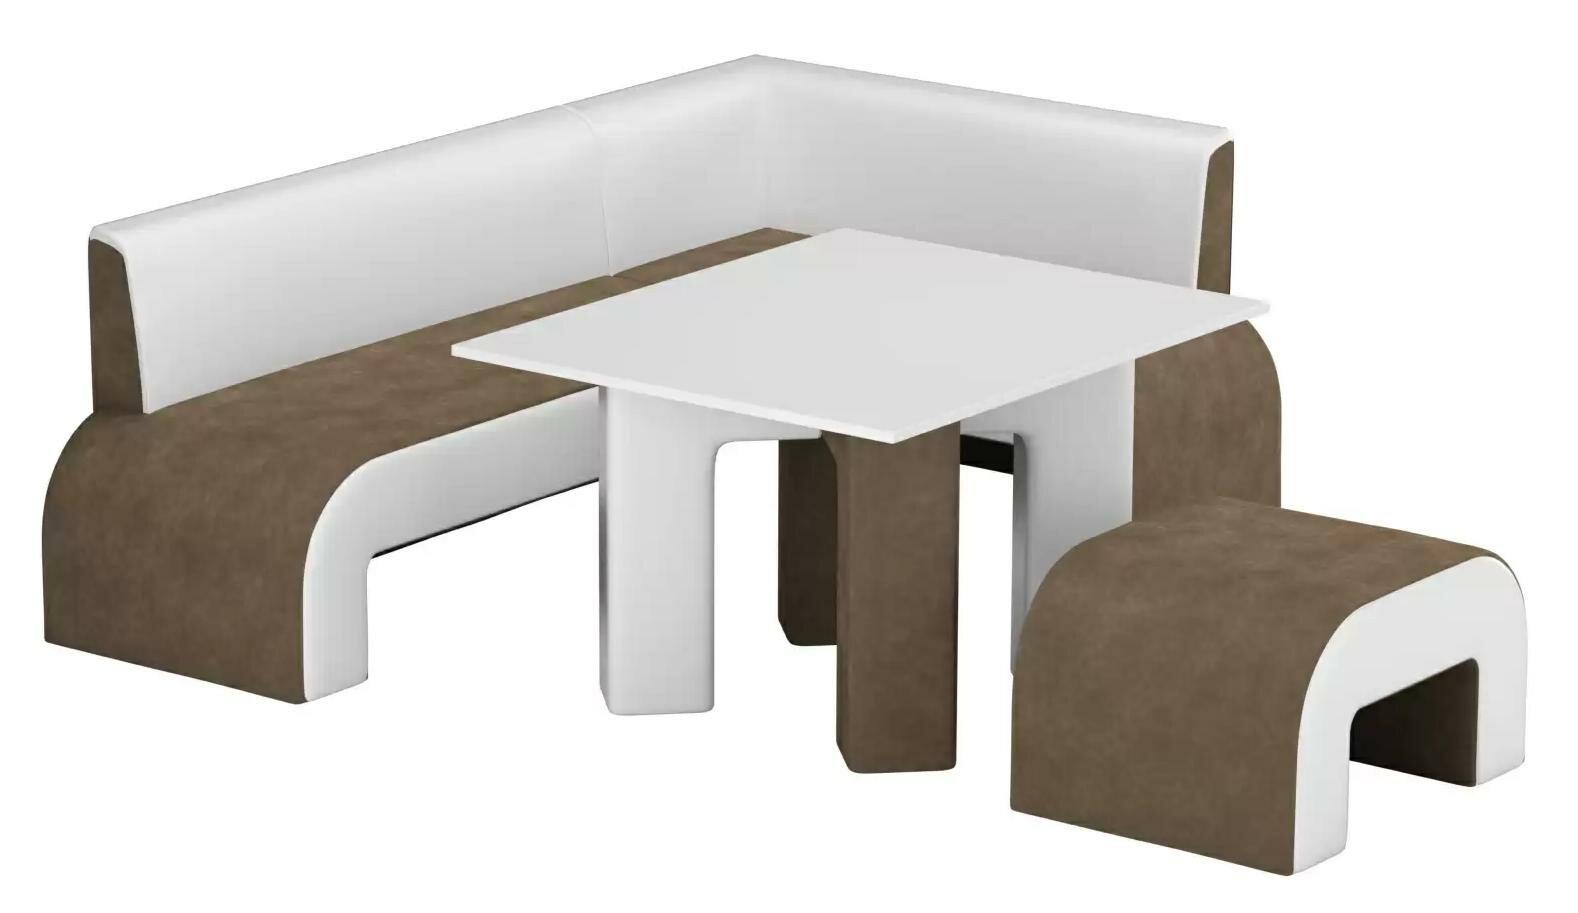 Мебель для кухни Мебелонс Кухонный уголок Кармен